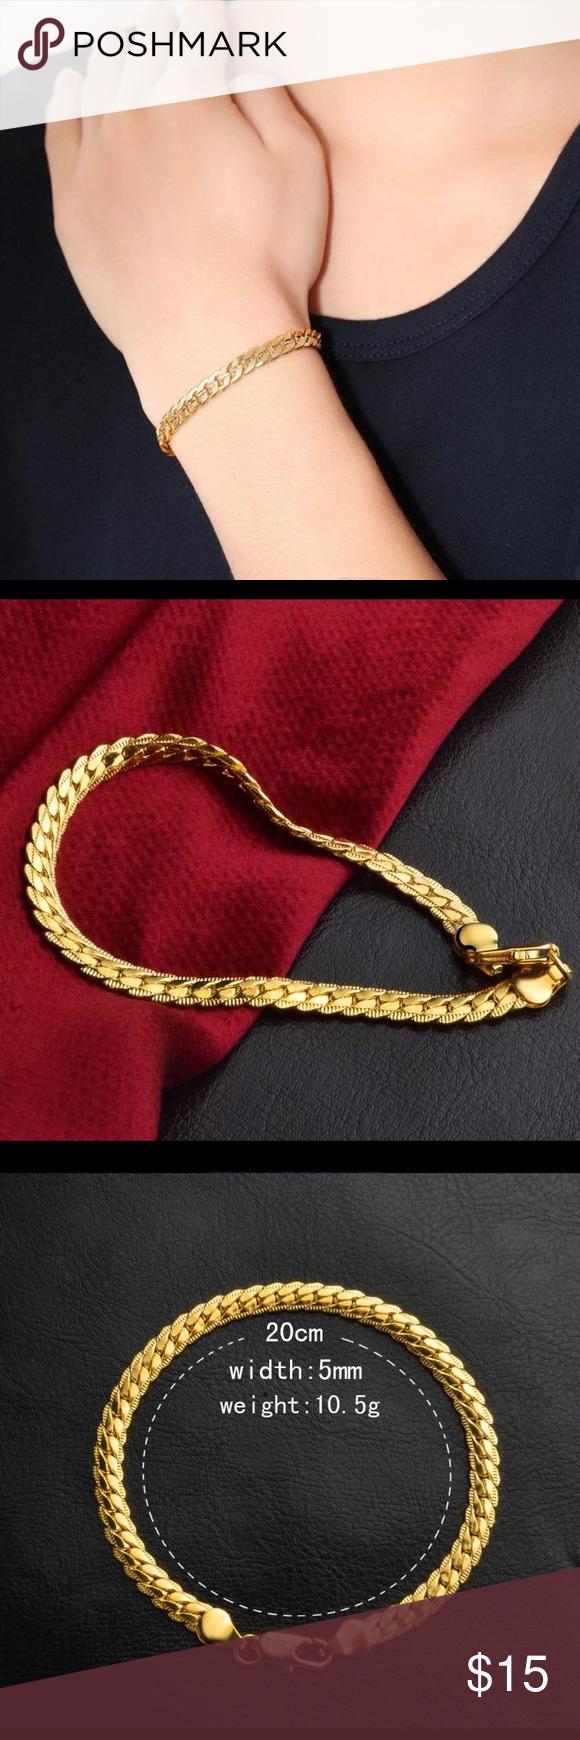 K gold plated unisex cuban bracelet nwt my posh closet